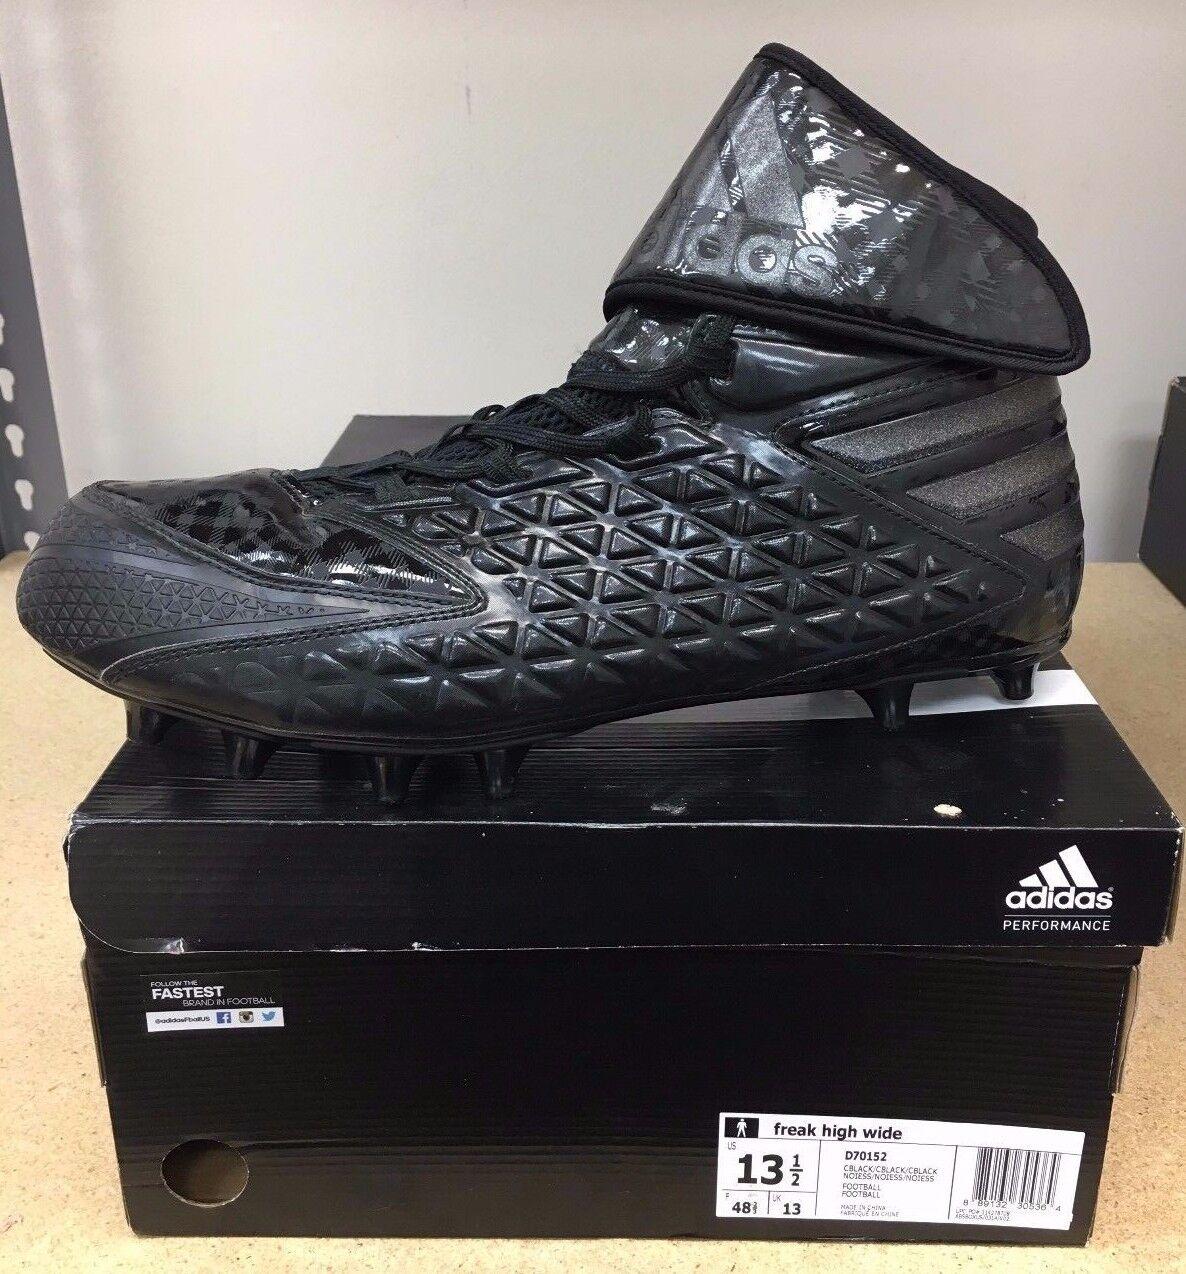 Adidas Freak High (Wide) Mens Football Cleat SKU D70152 Size 13.5